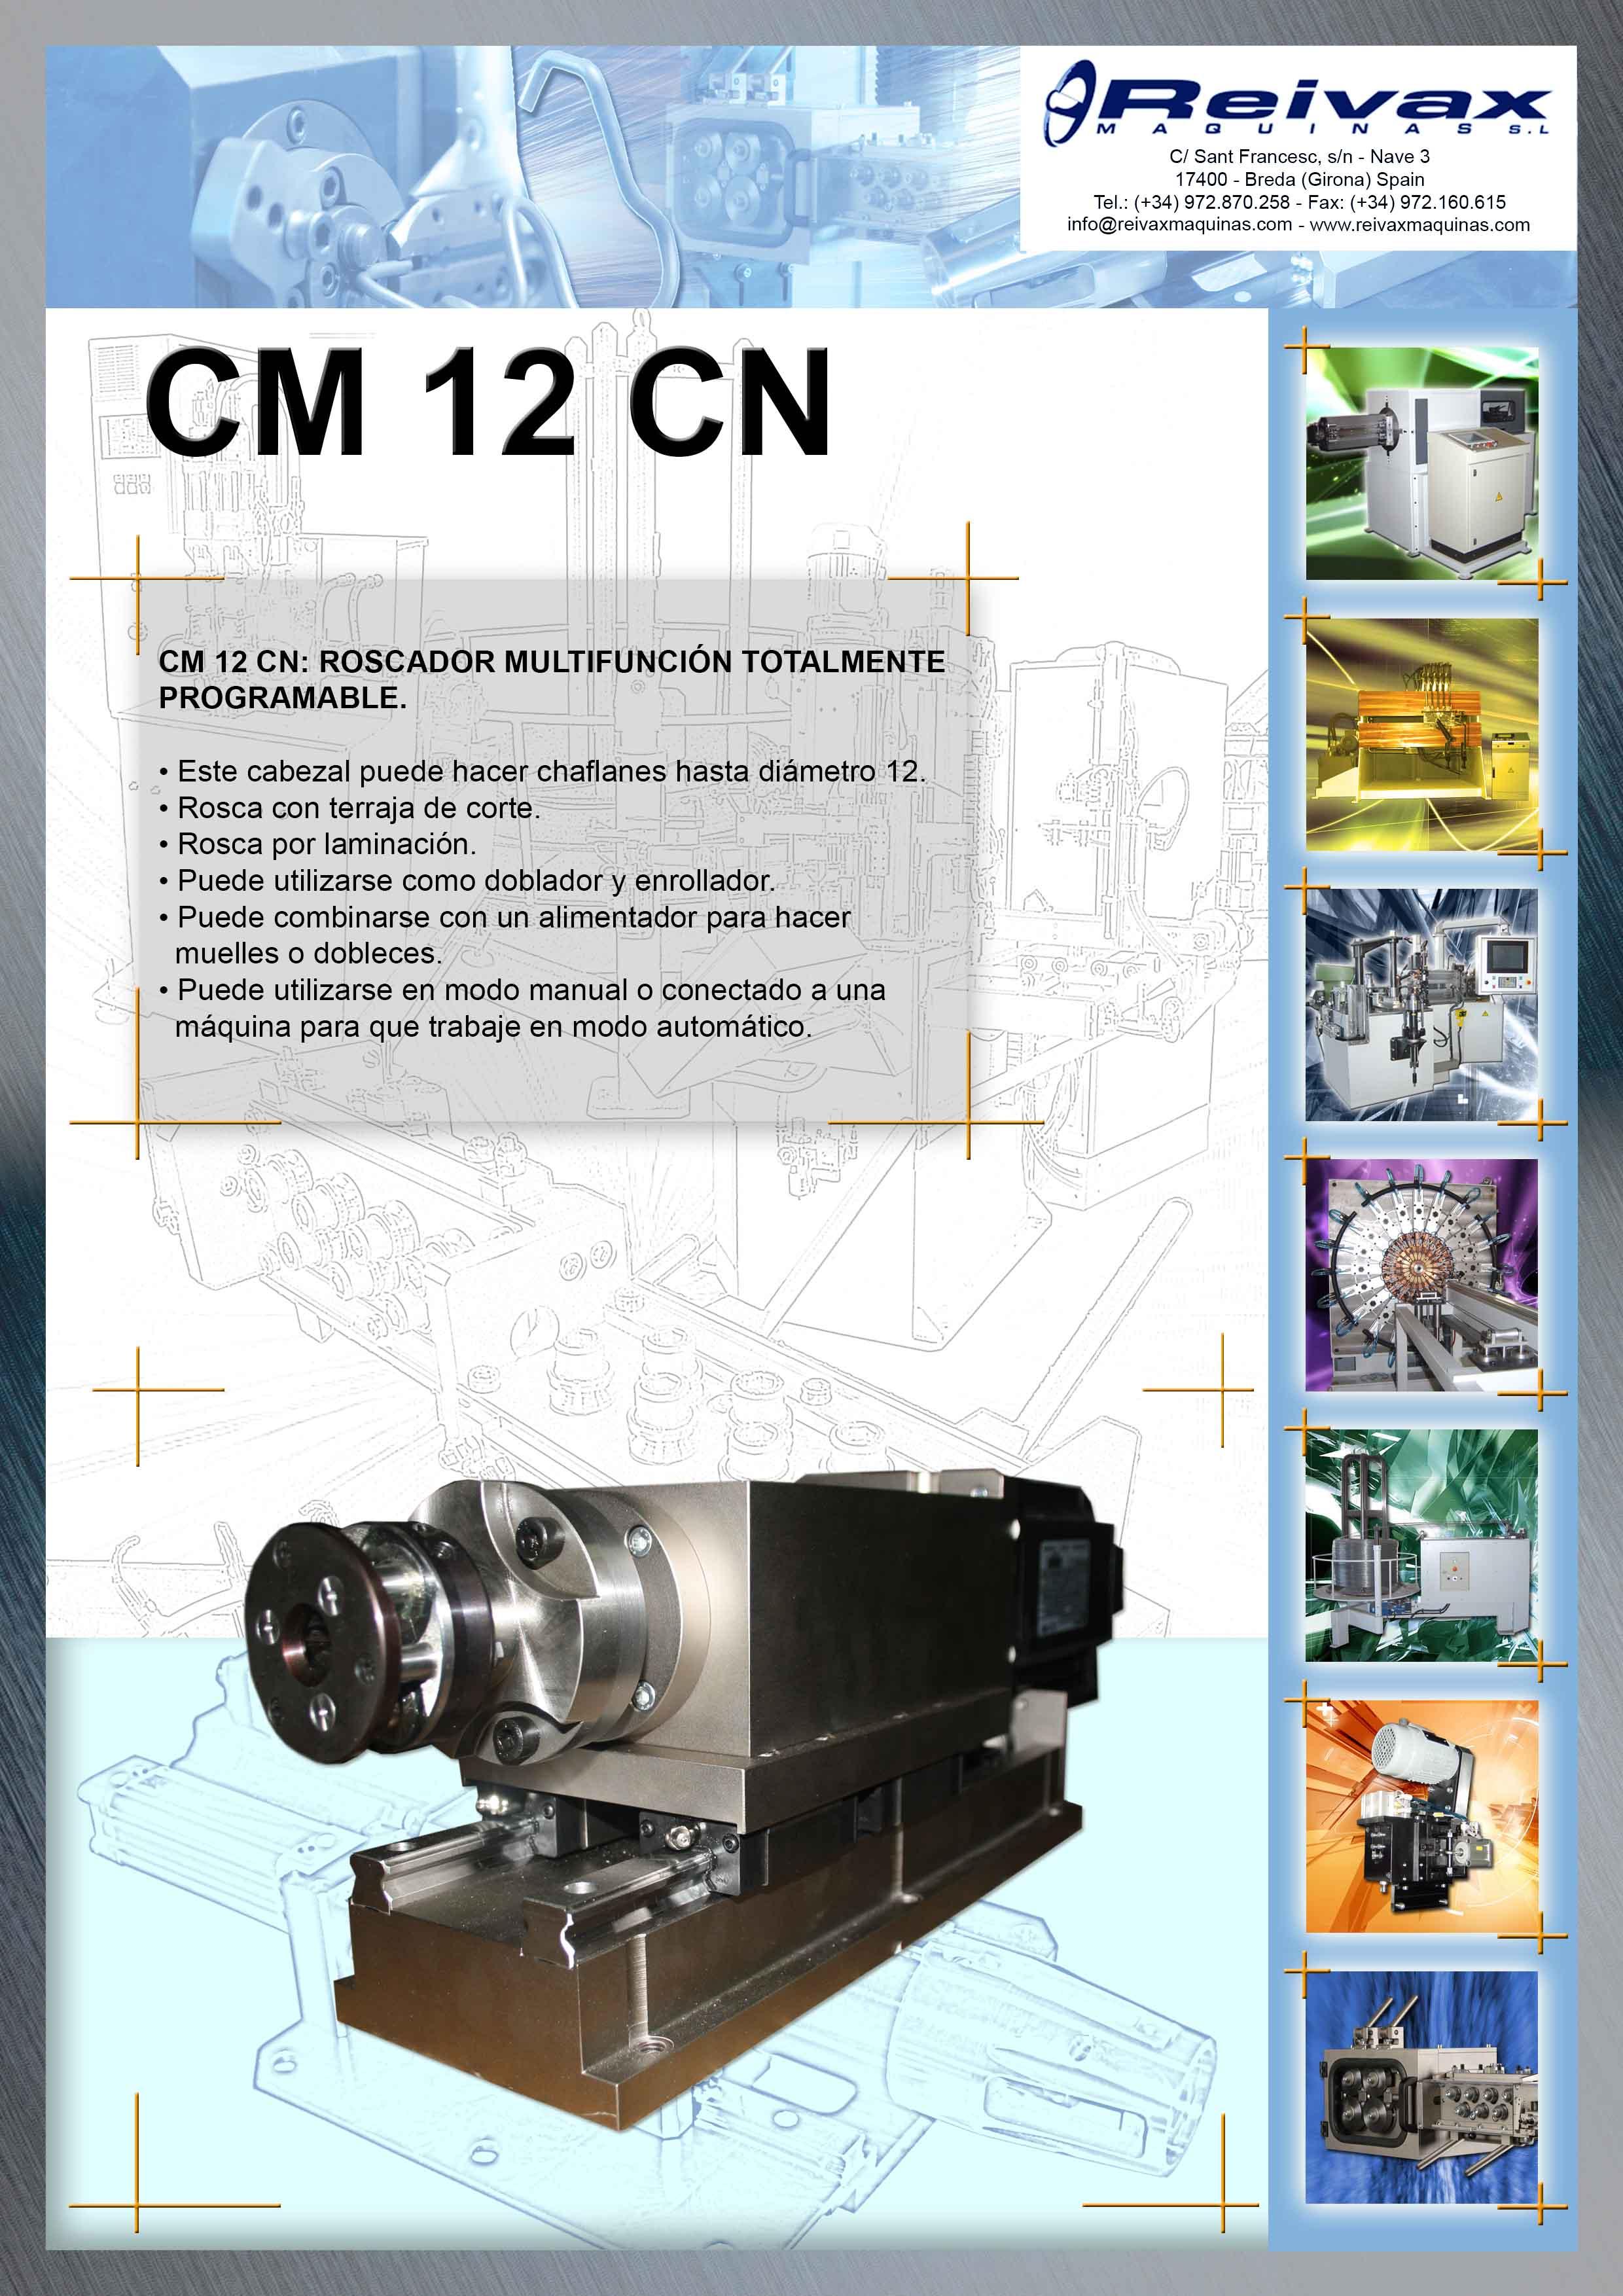 ReivaxMaquinas: Ficha Tecnica CM 12 CN